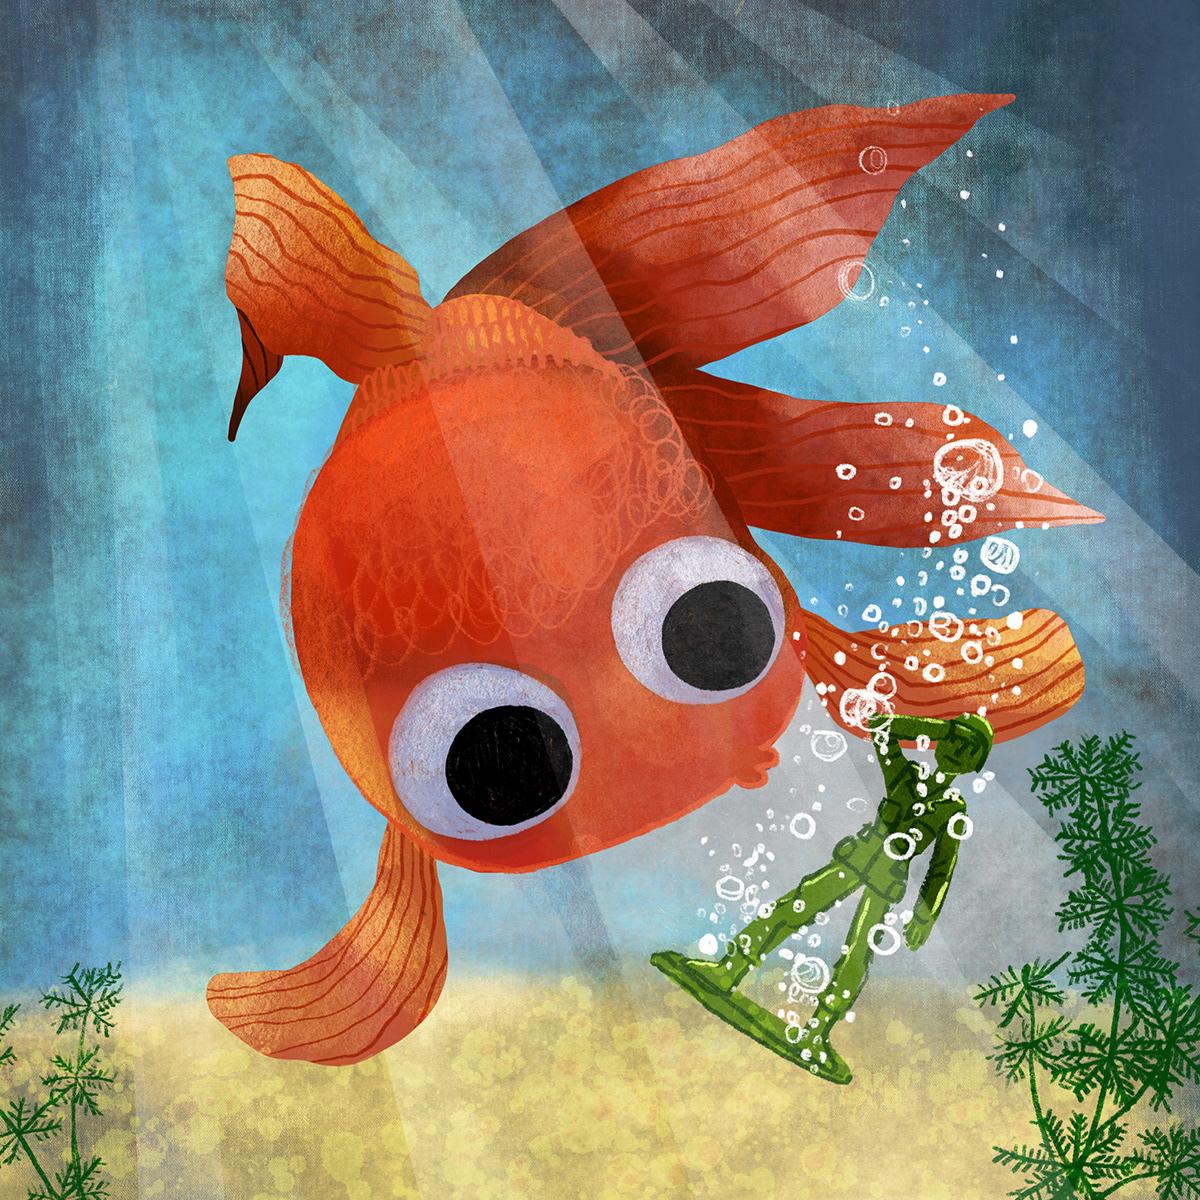 children'sillustration fish fish bowl fish illustration kidlit kidlitart